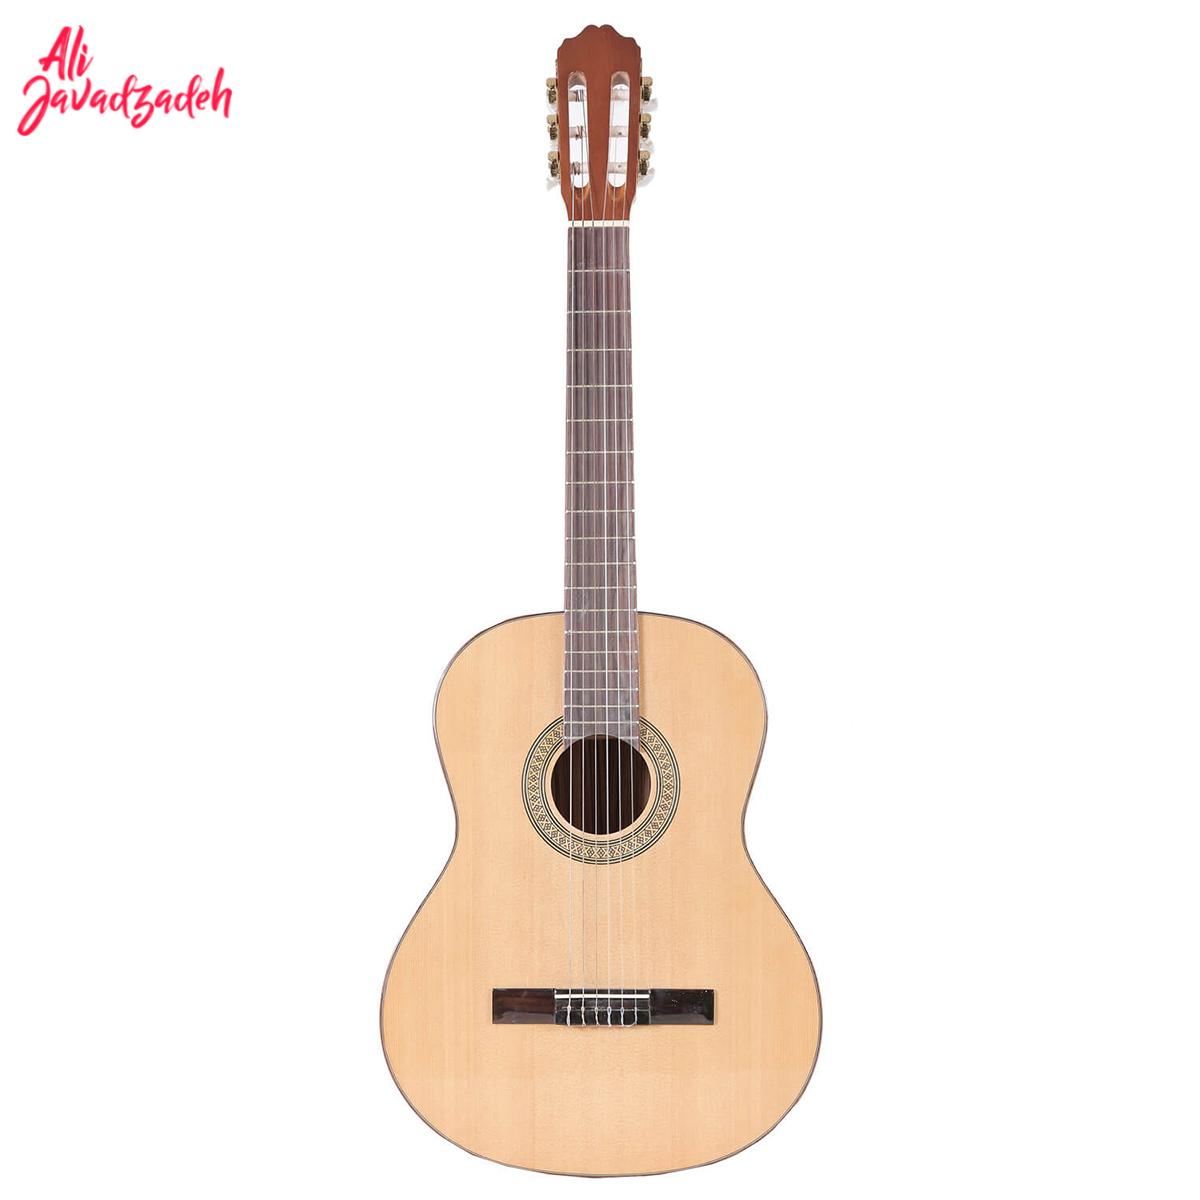 گیتار کلاسیک کوردوبا مدل Rodriguez C3A